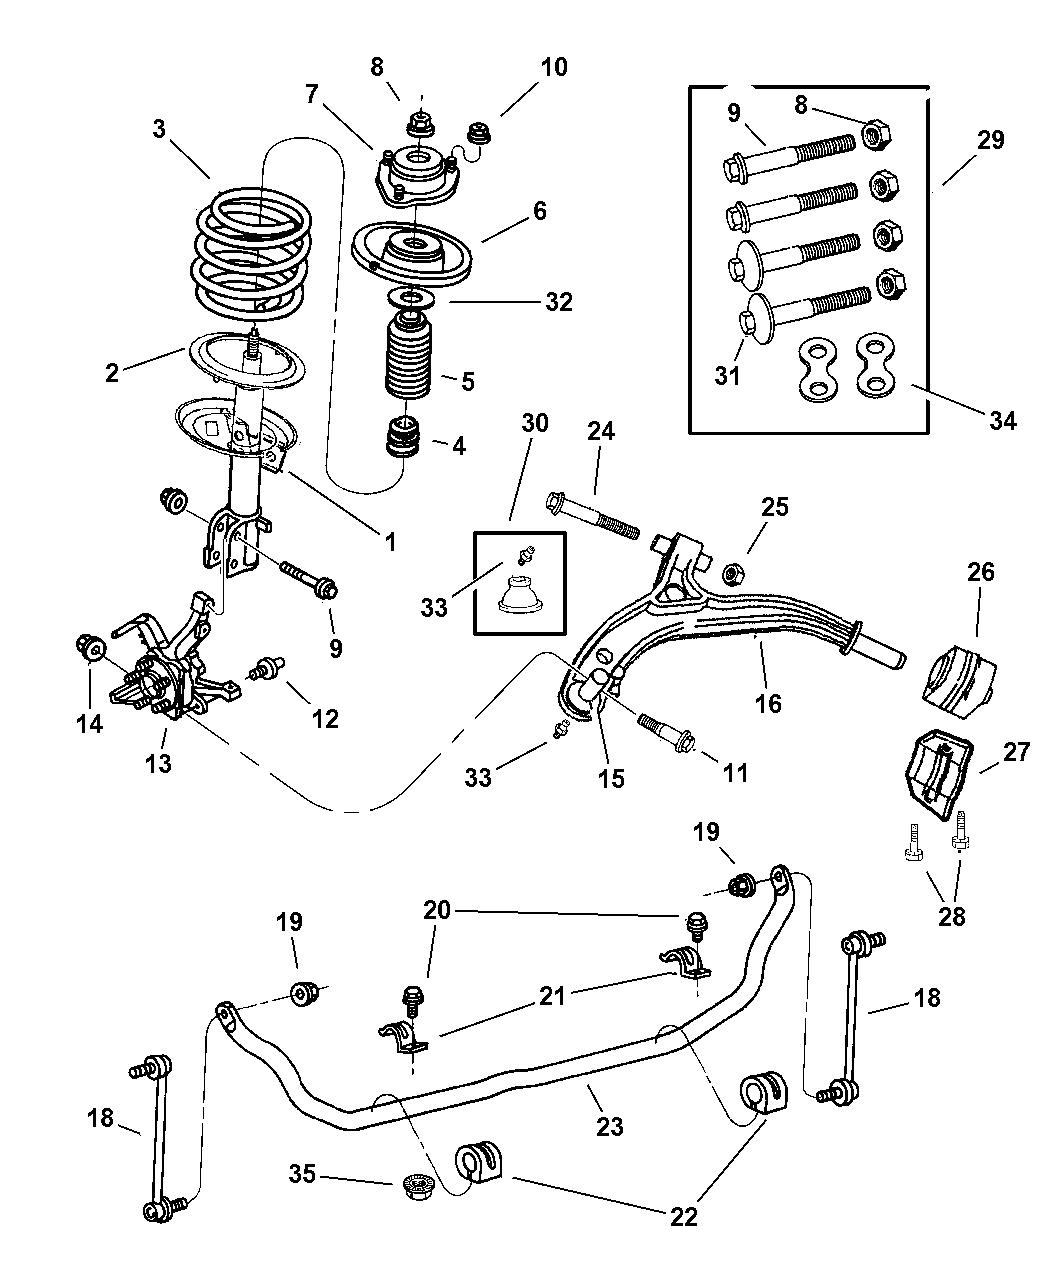 1999 Dodge Caravan Suspension